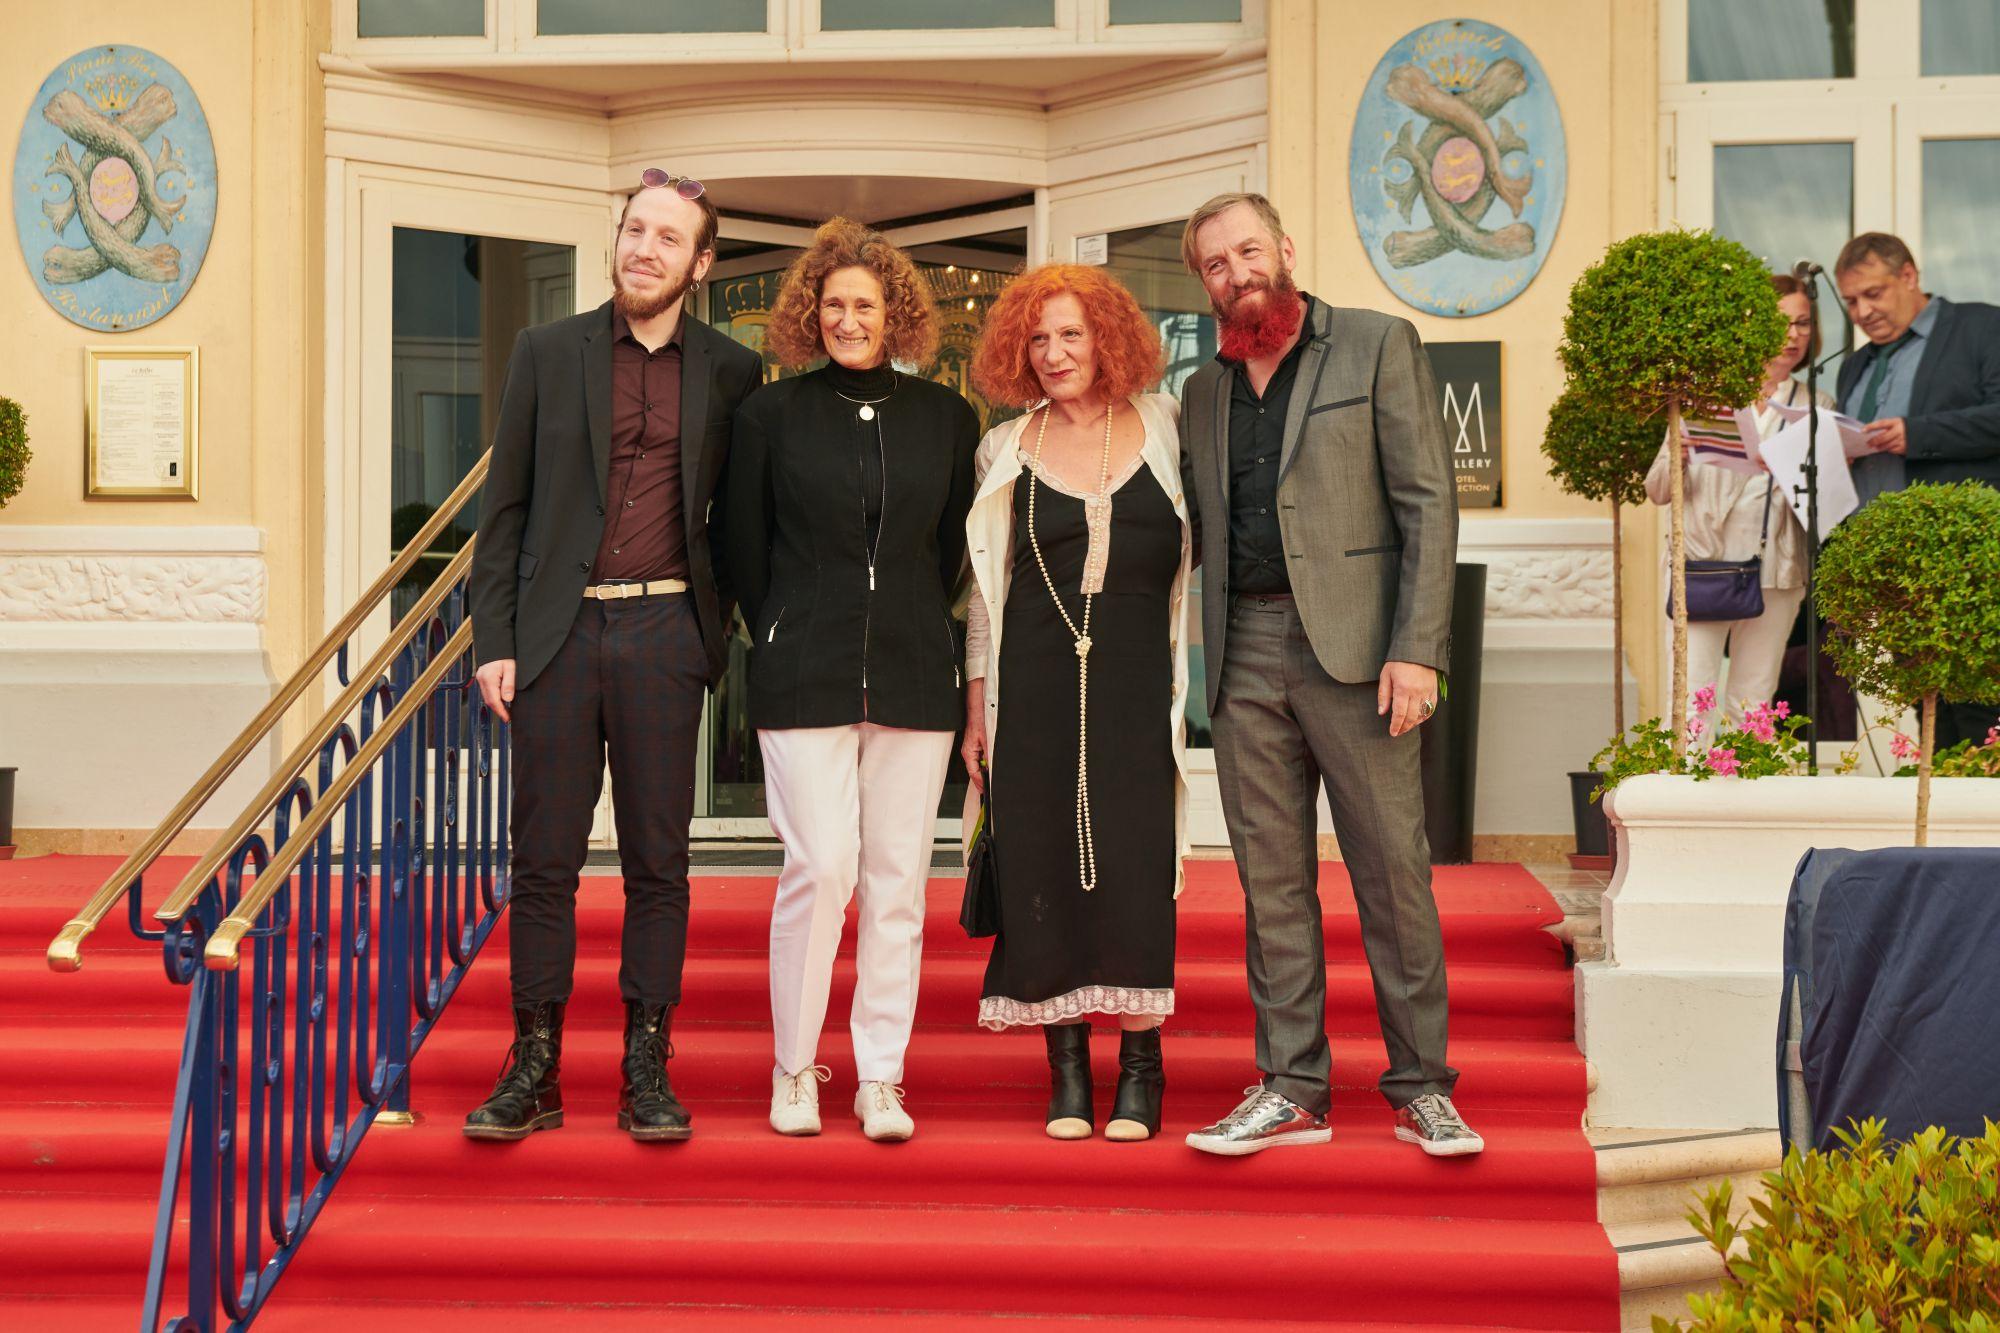 Galaad Lebeault (compositeur), Yann Samuell (réalisateur), Emmanuelle Gronvold, Fabienne Bichet